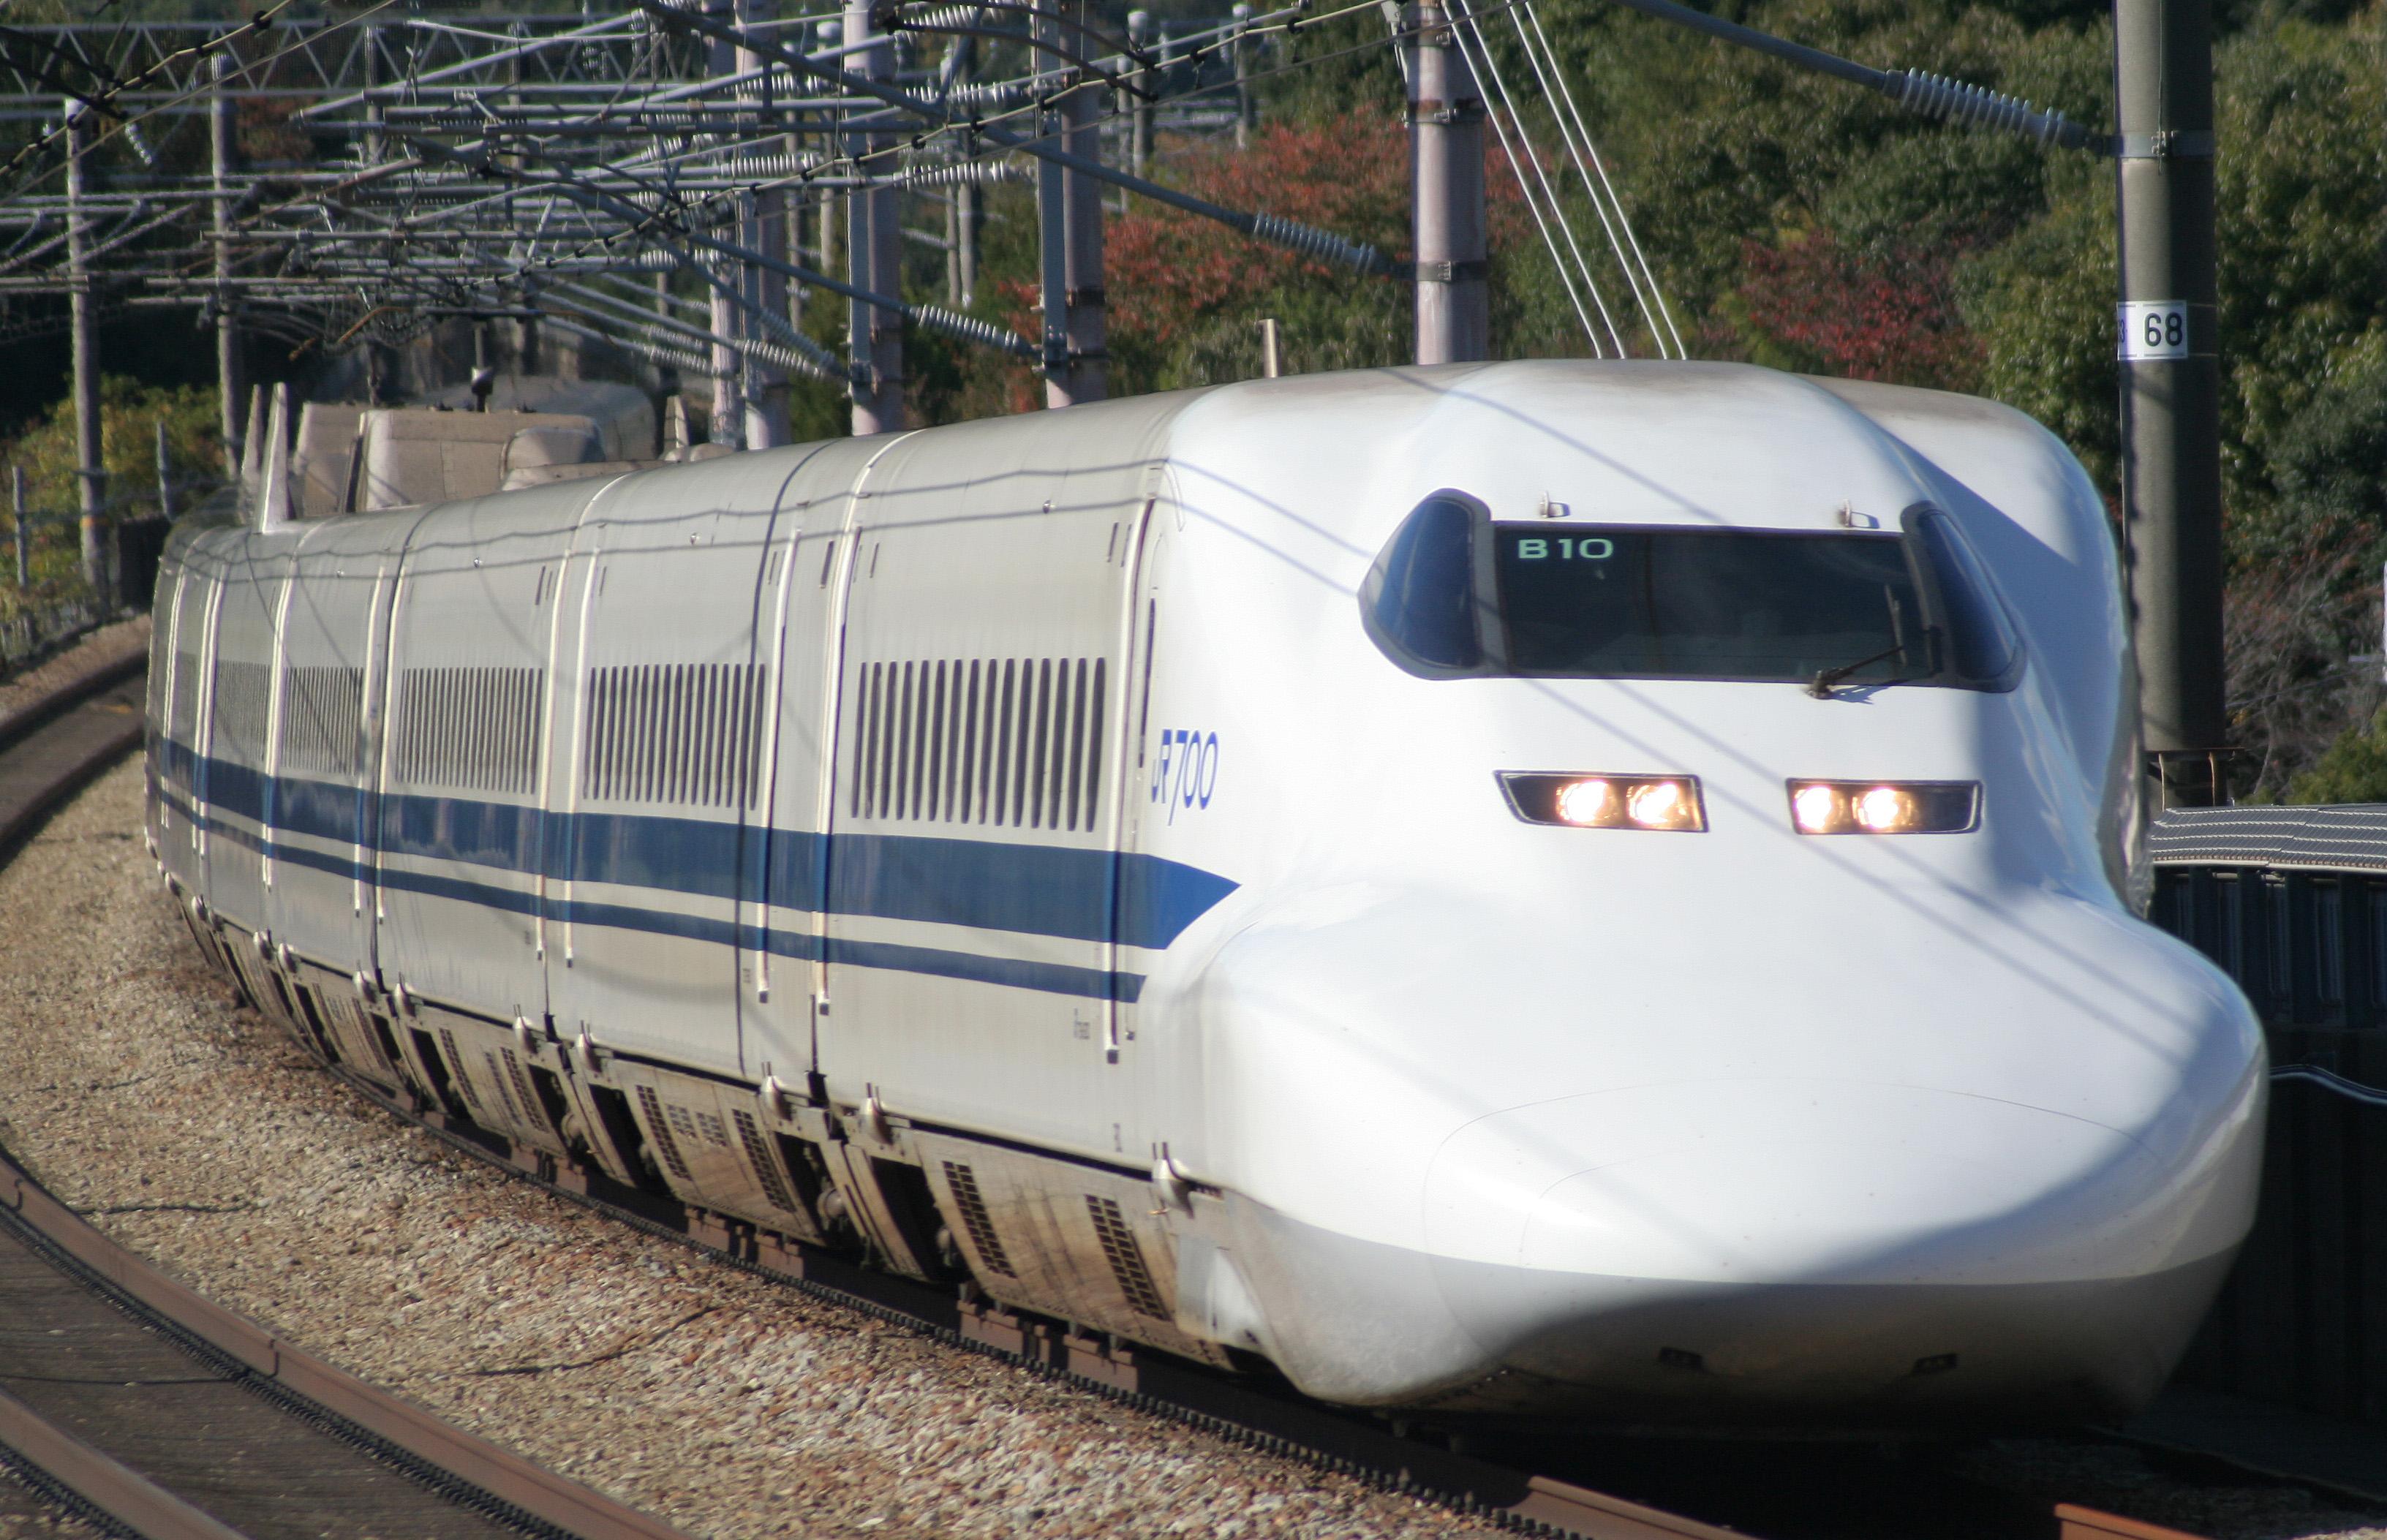 case study shinkansen The impact of high speed rail on tourism development: a case study speed rail on tourism development: a by utilizing shinkansen through a case study of.